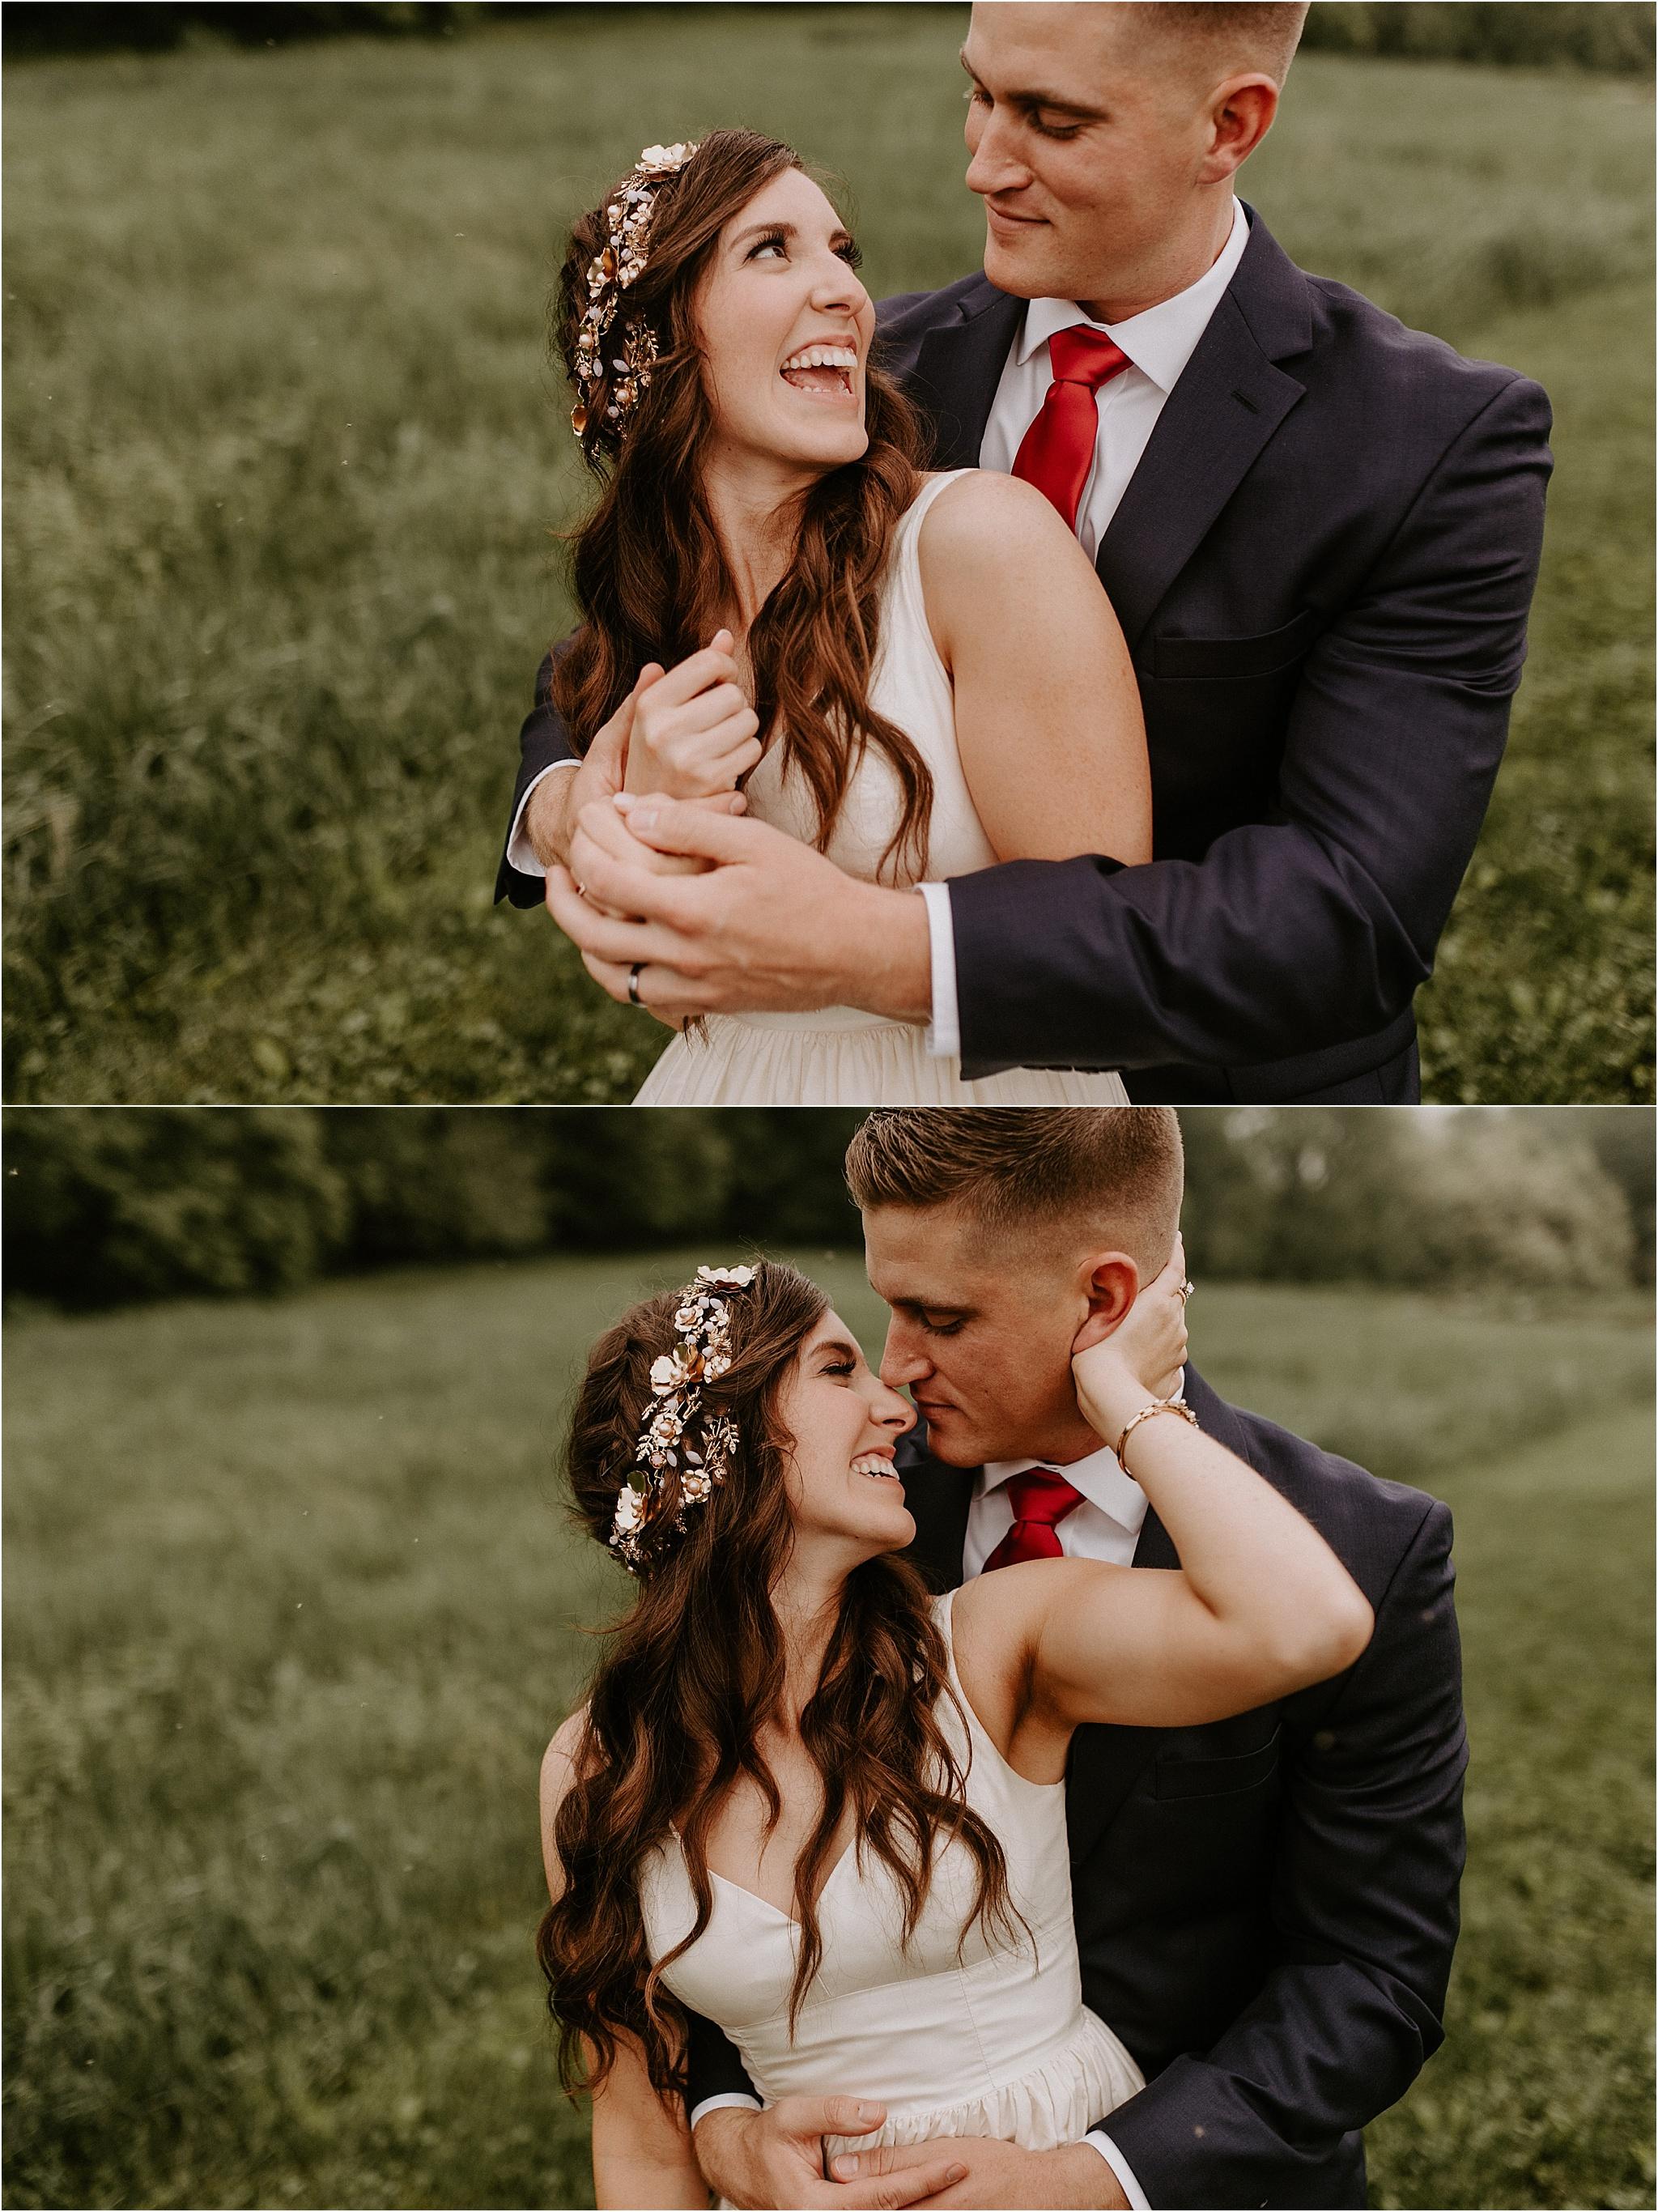 Sarah_Brookhart_Farm_at_Eagles_Ridge_Wedding_Photographer_0062.jpg